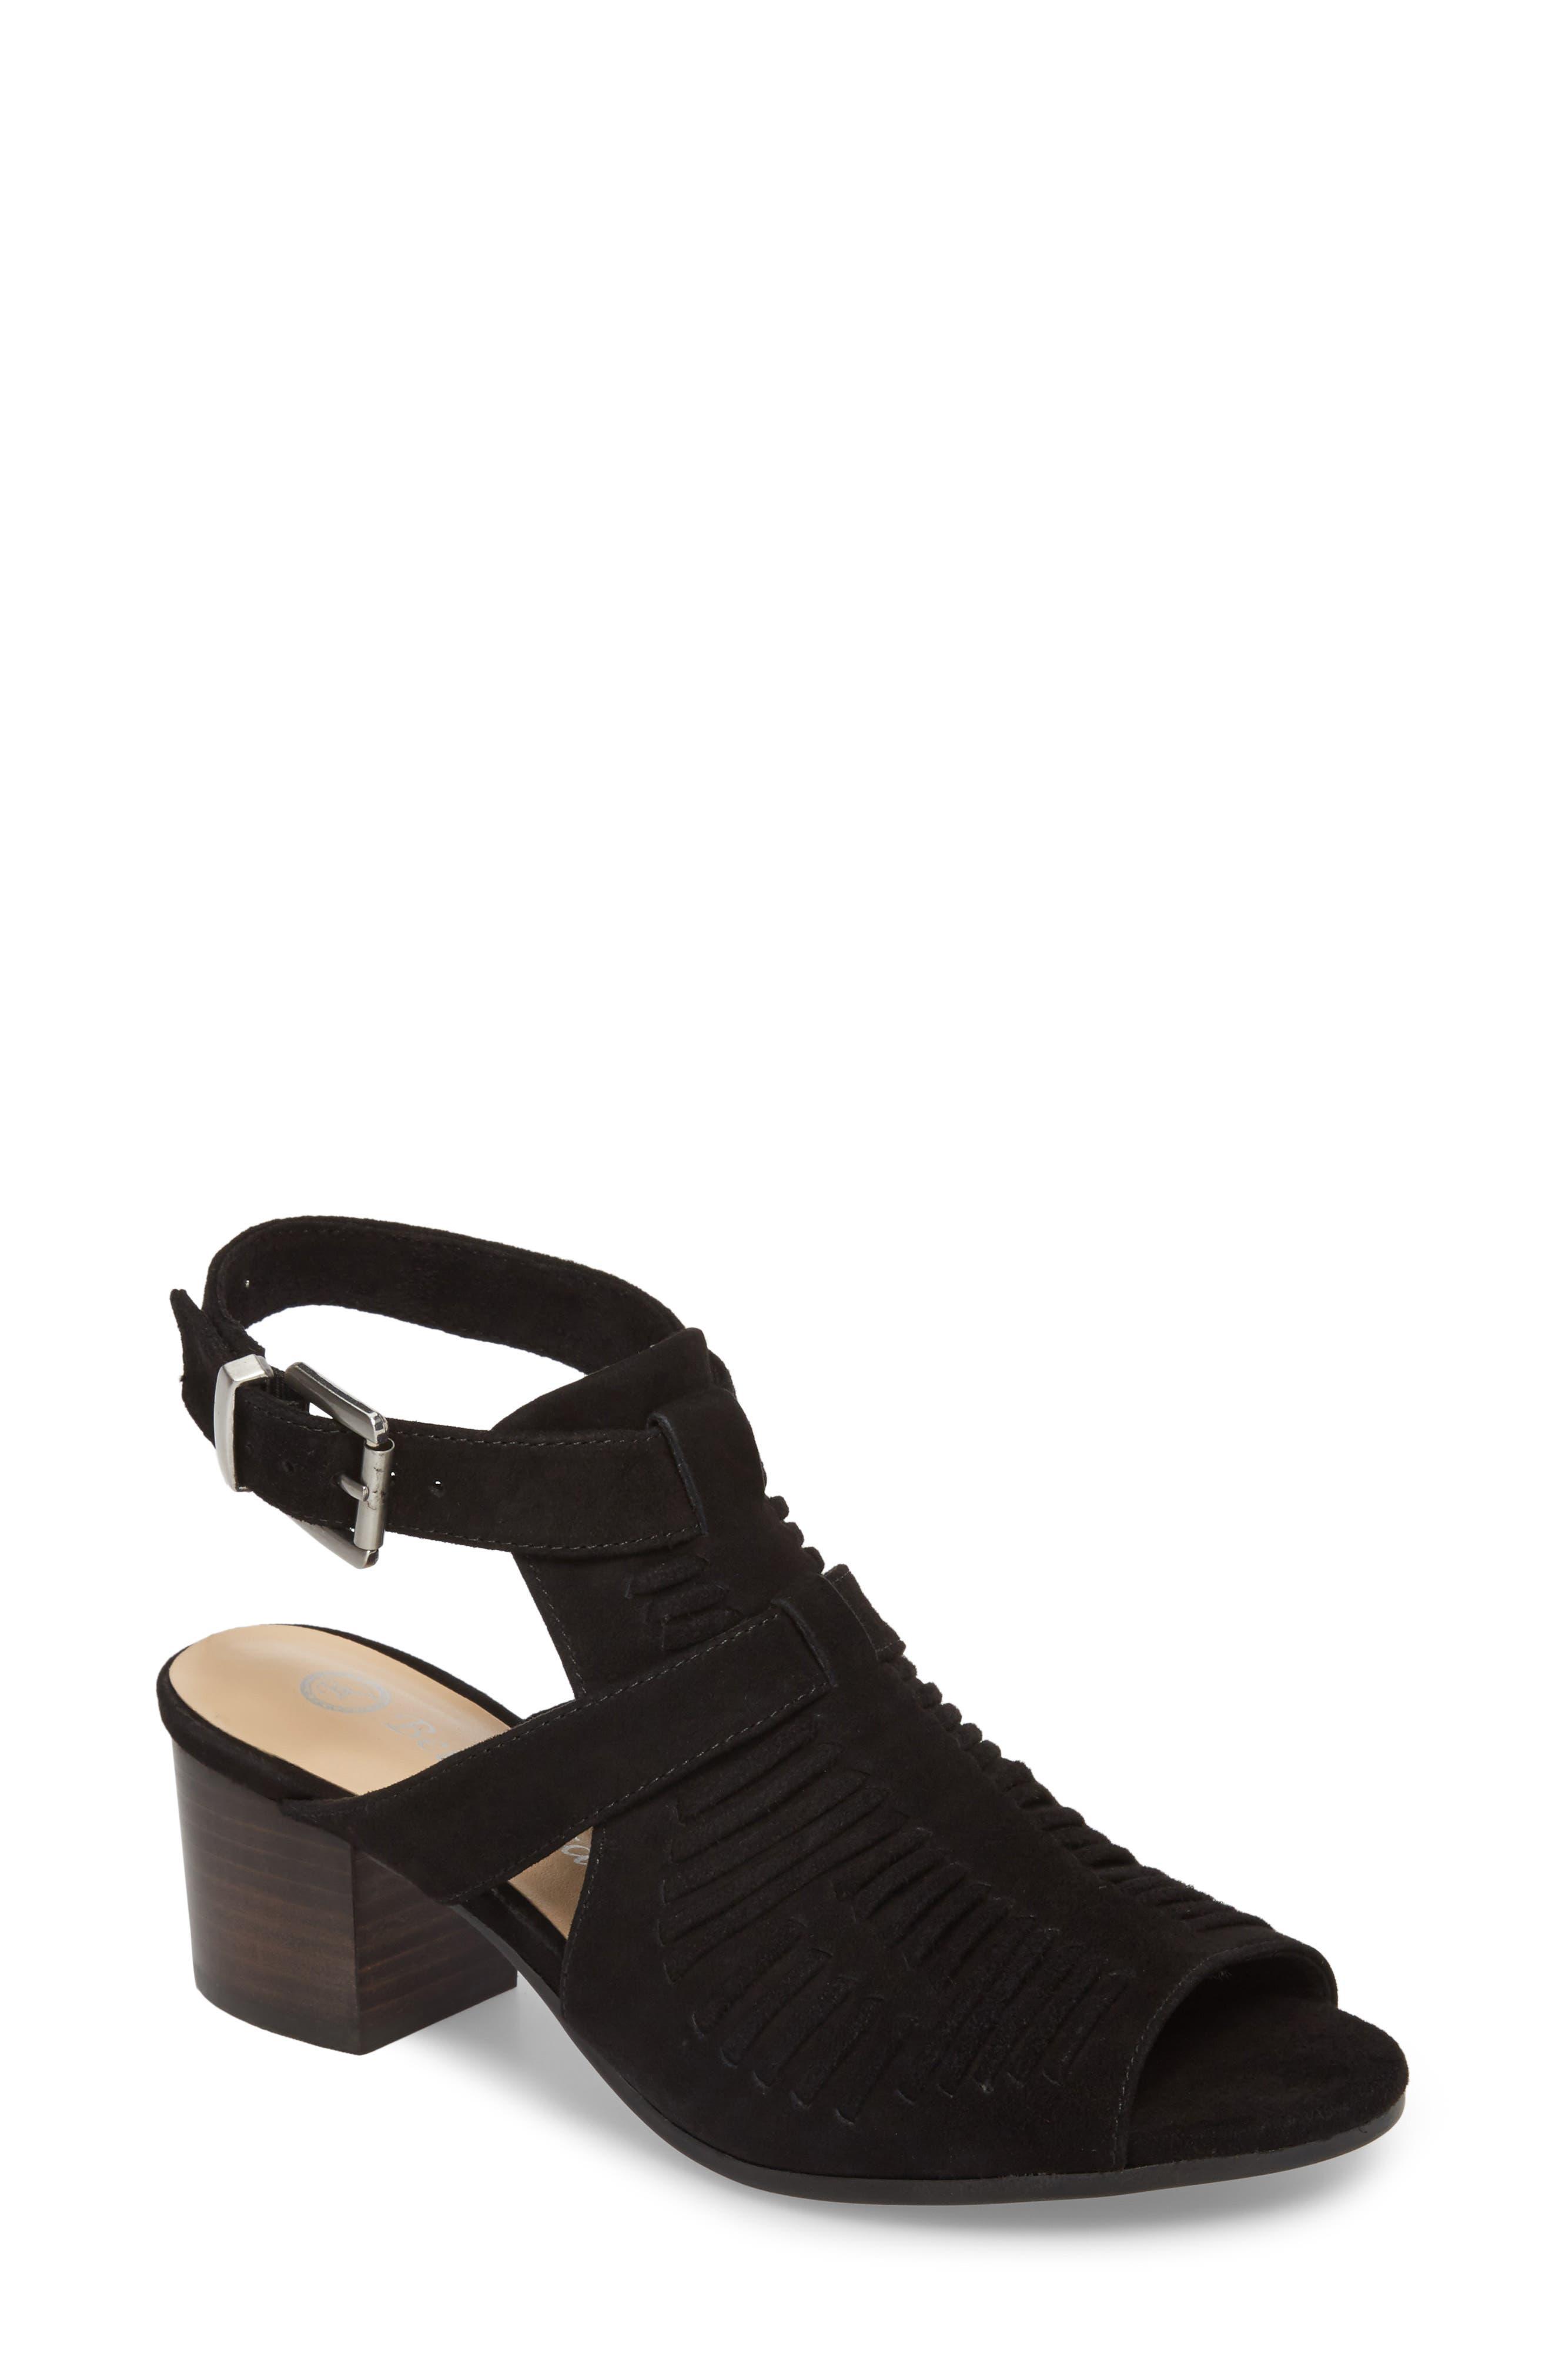 Finley Ankle Strap Sandal,                         Main,                         color, Black Suede